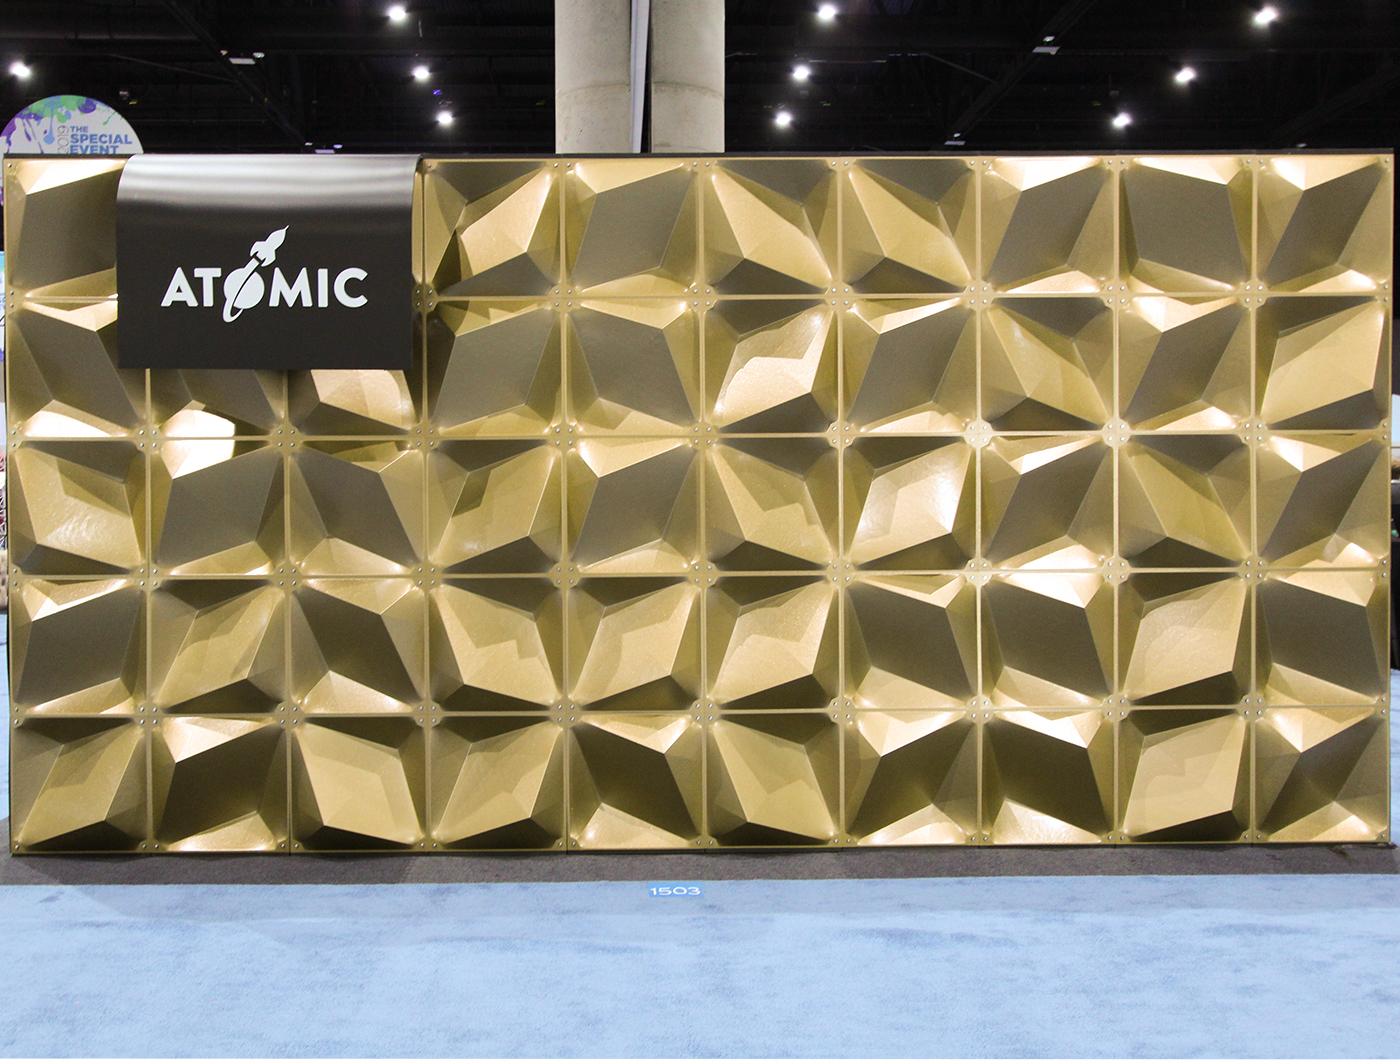 Zeddit Premium gold panels create a dazzling backdrop